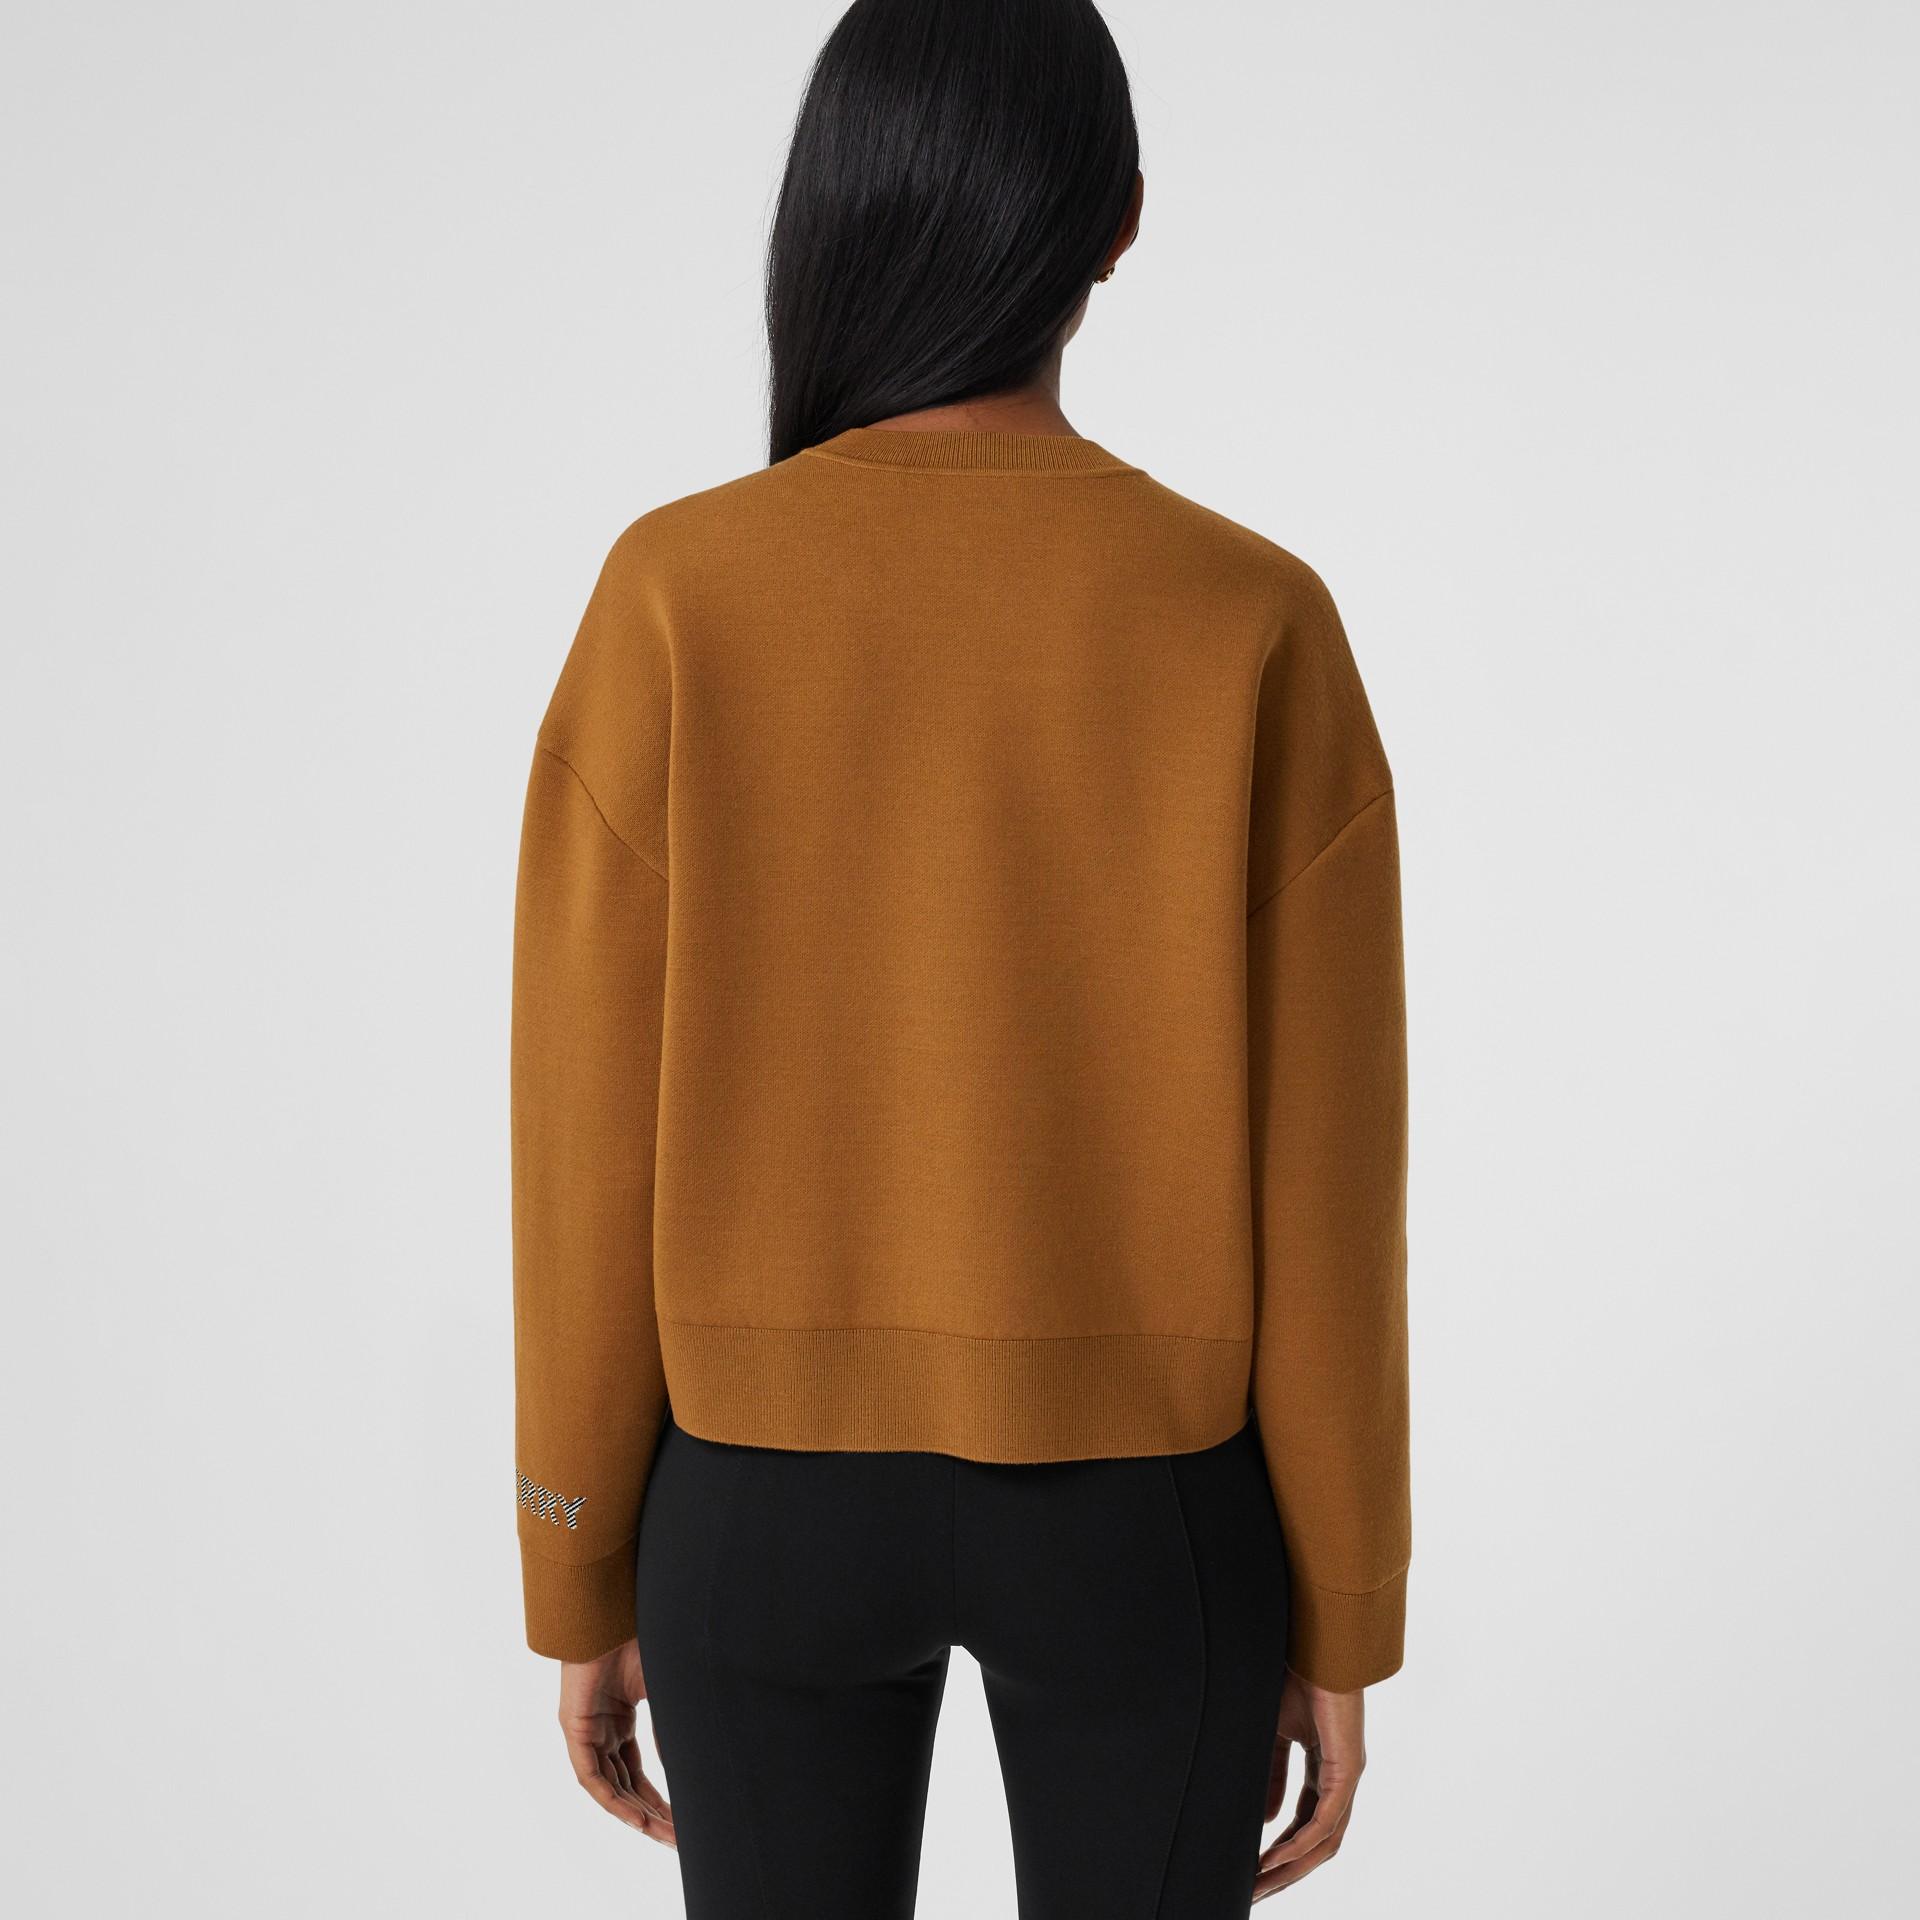 Logo Technical Merino Wool Jacquard Sweater in Chestnut - Women   Burberry - gallery image 2